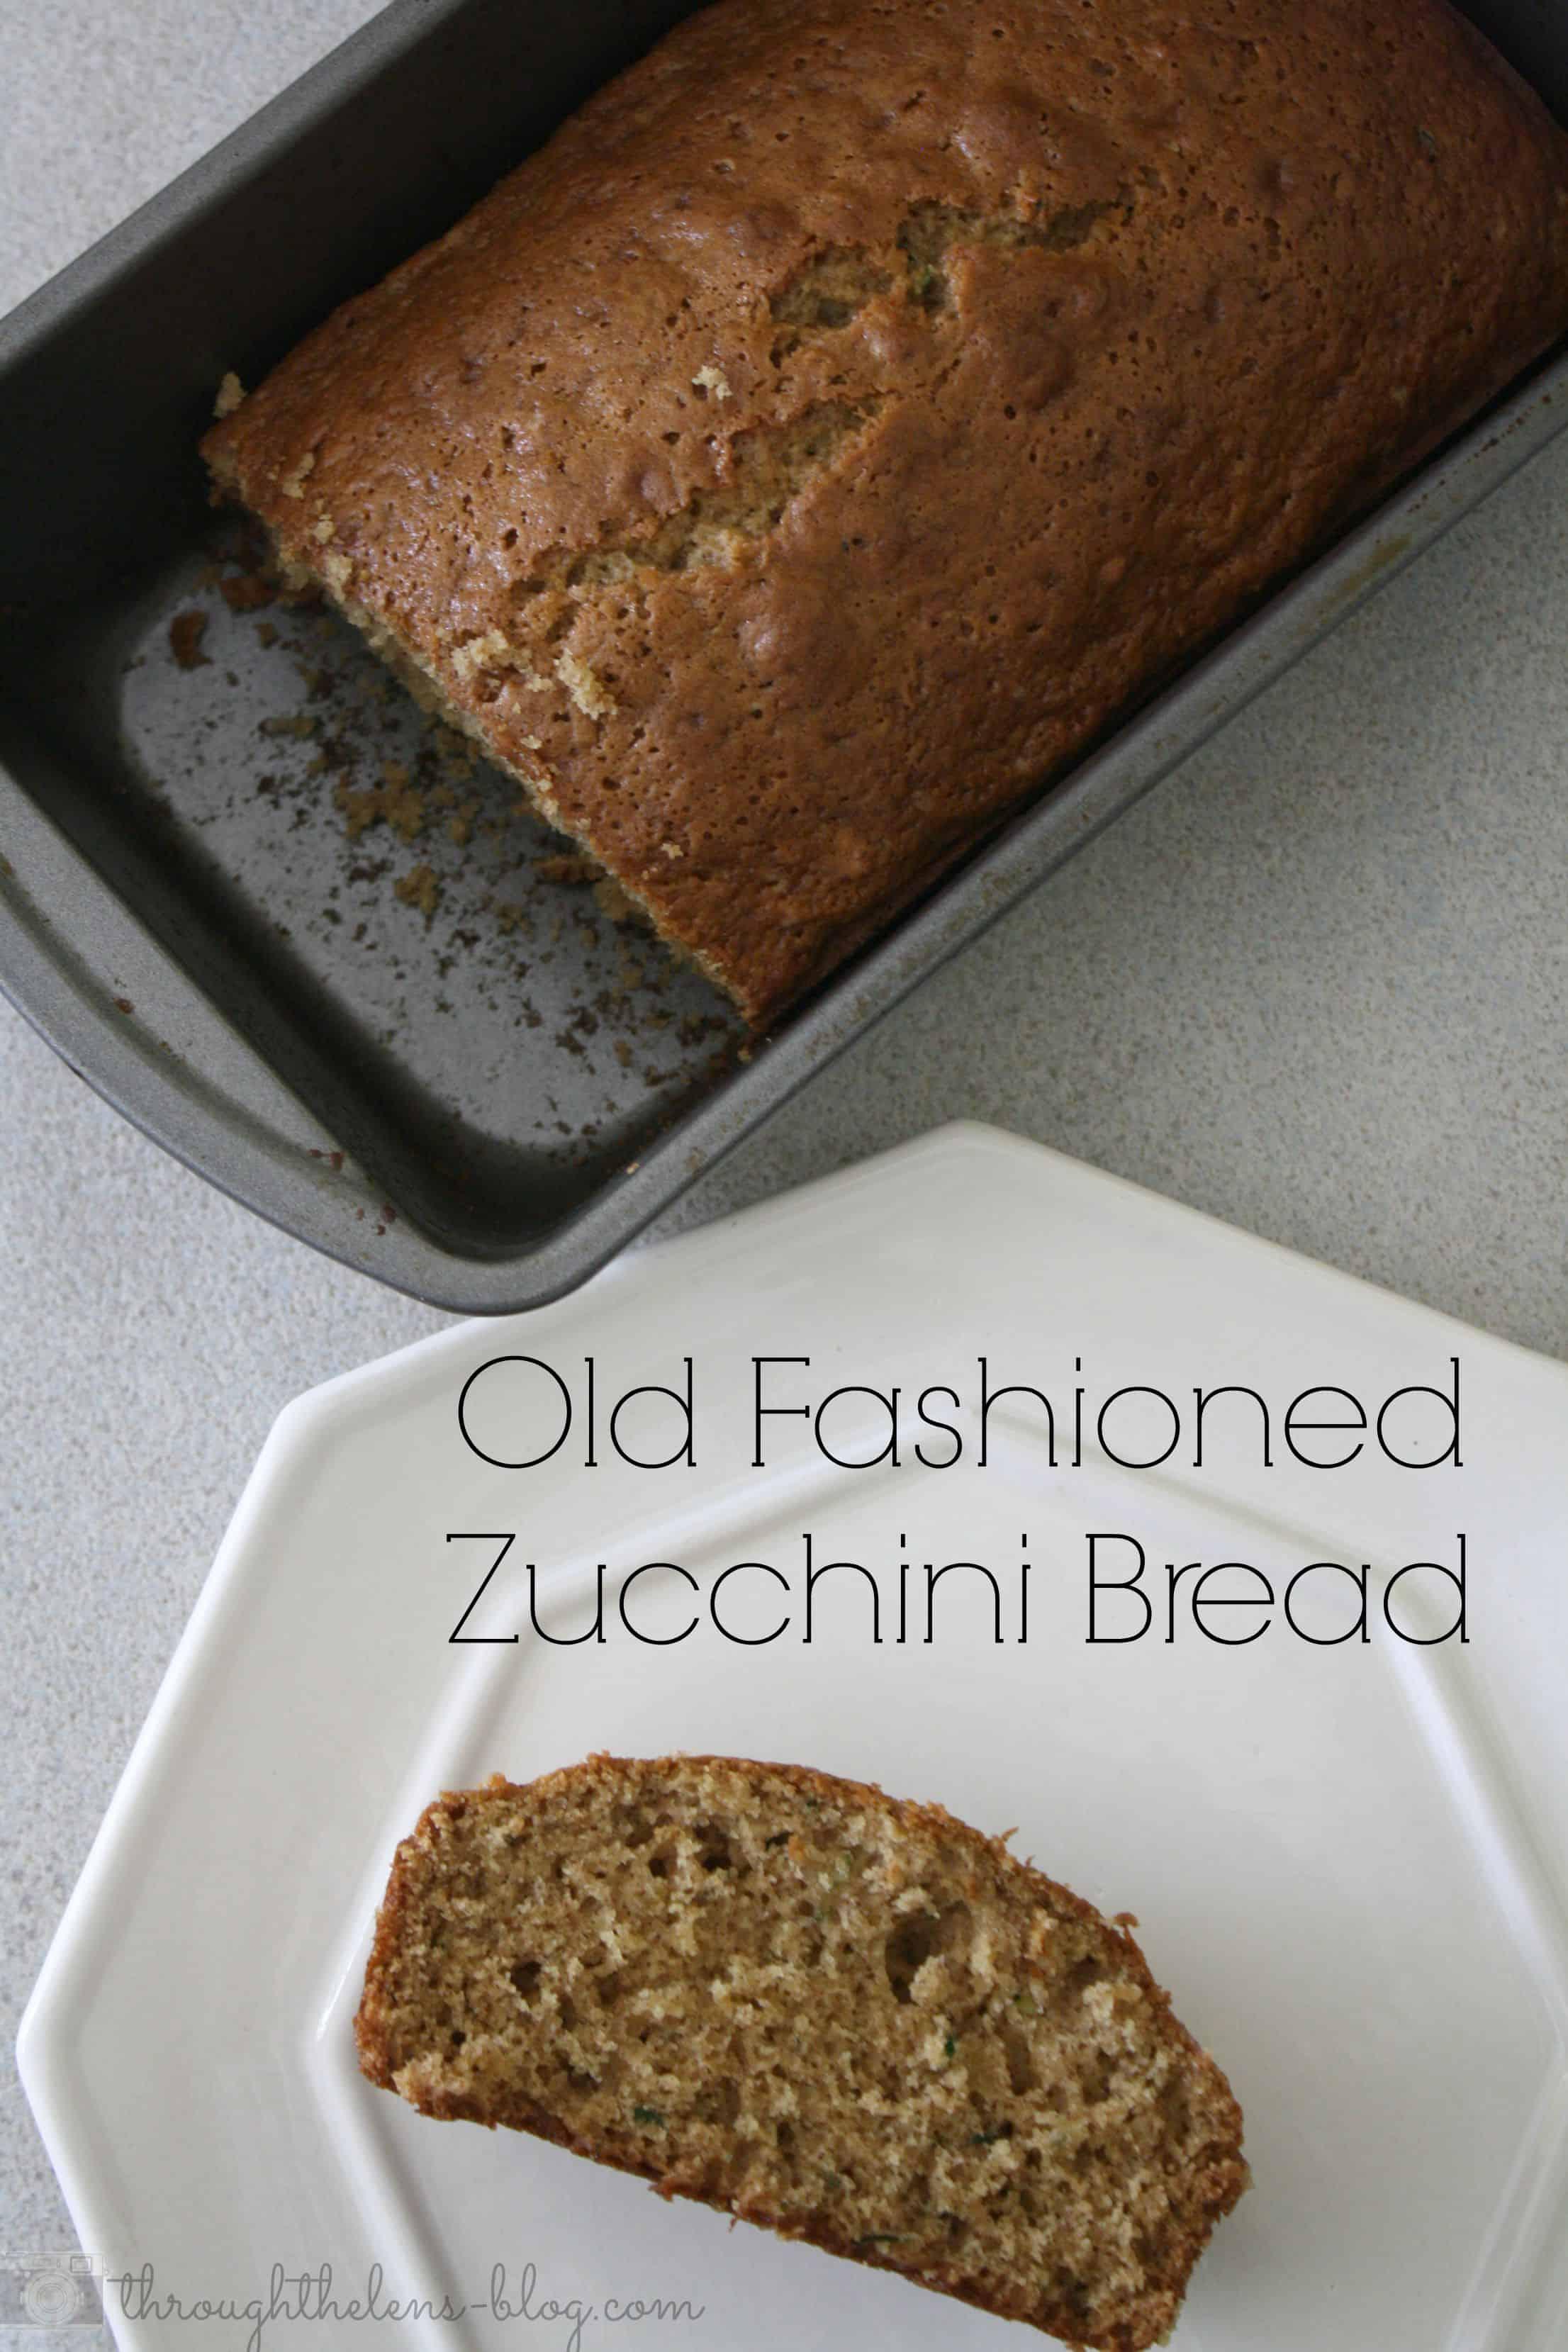 Old Fashioned Zucchini Bread Domestically Speaking